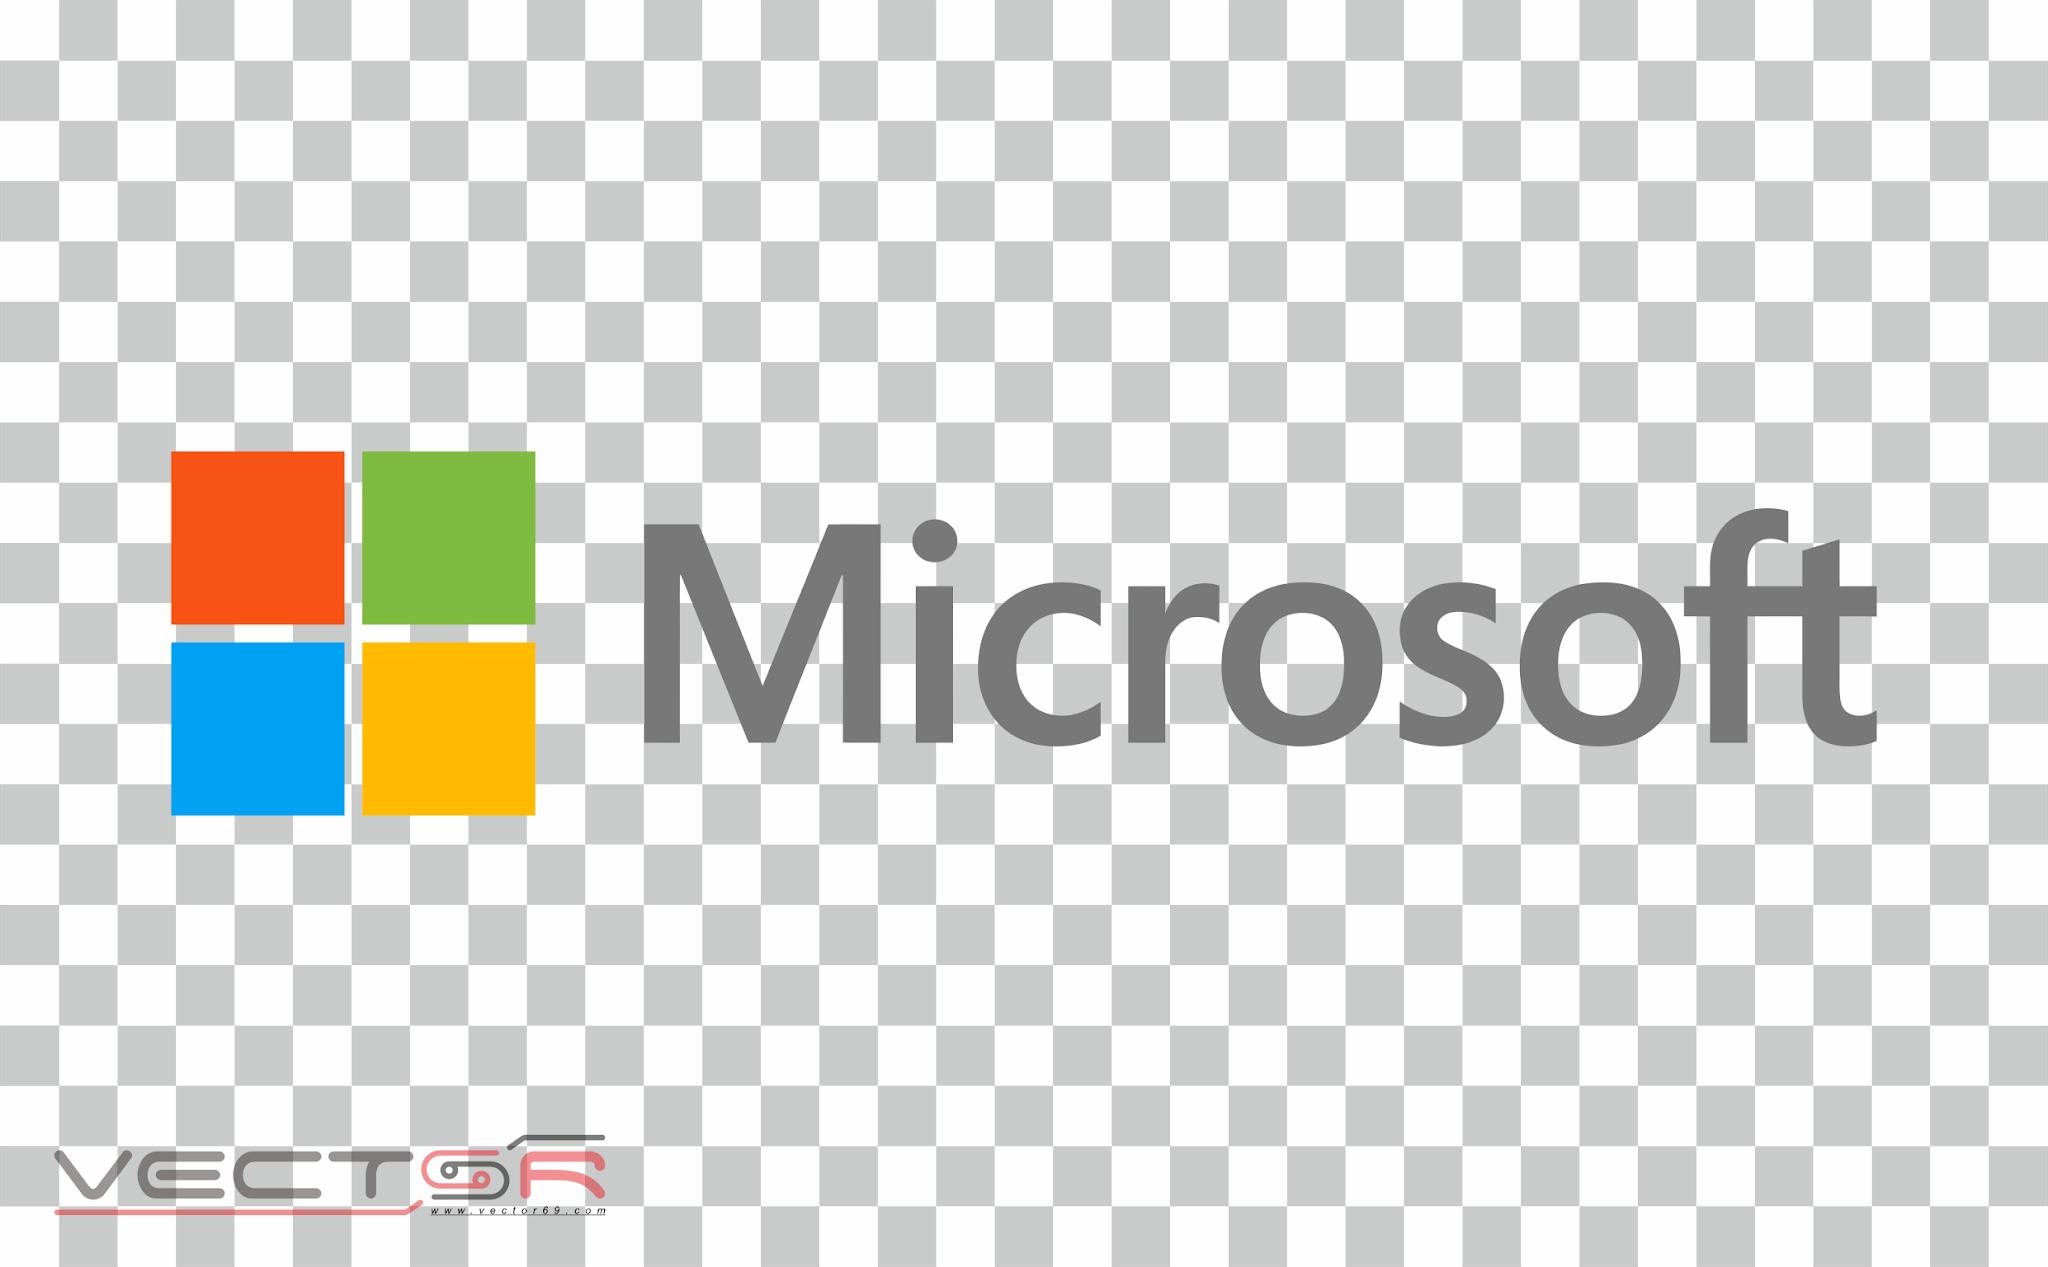 Microsoft Logo - Download .PNG (Portable Network Graphics) Transparent Images